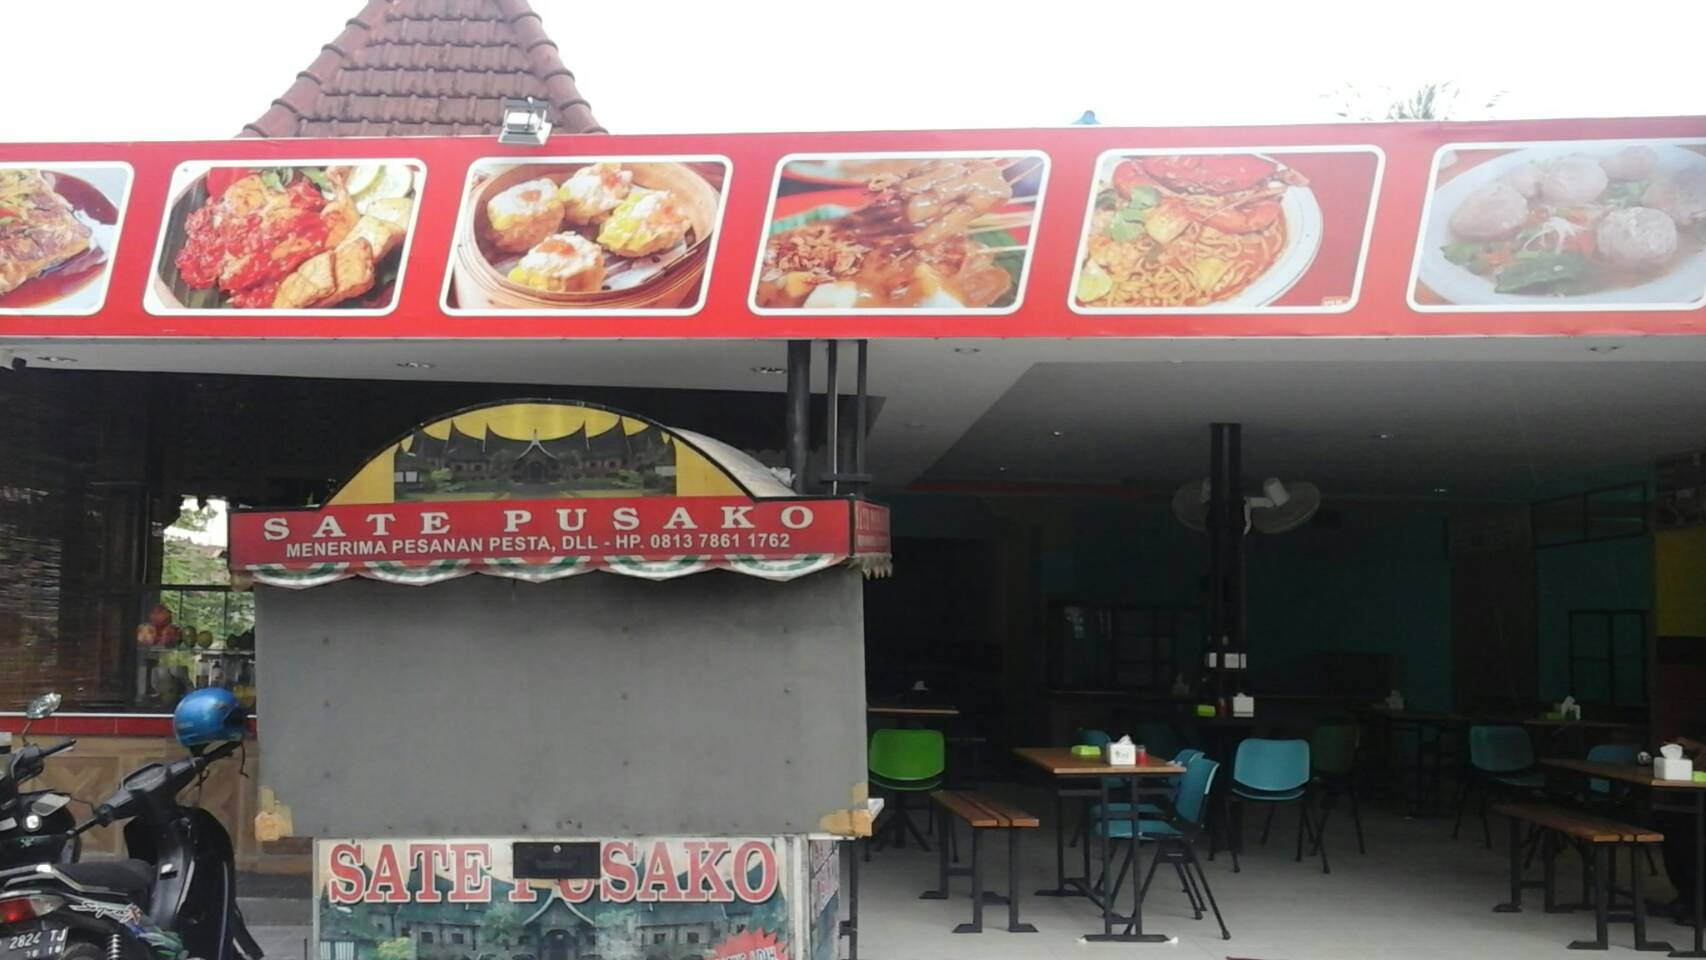 1504062140927 - Usaha Foodcourt And Coffee, Tempat Nongkrong Pekanbaru